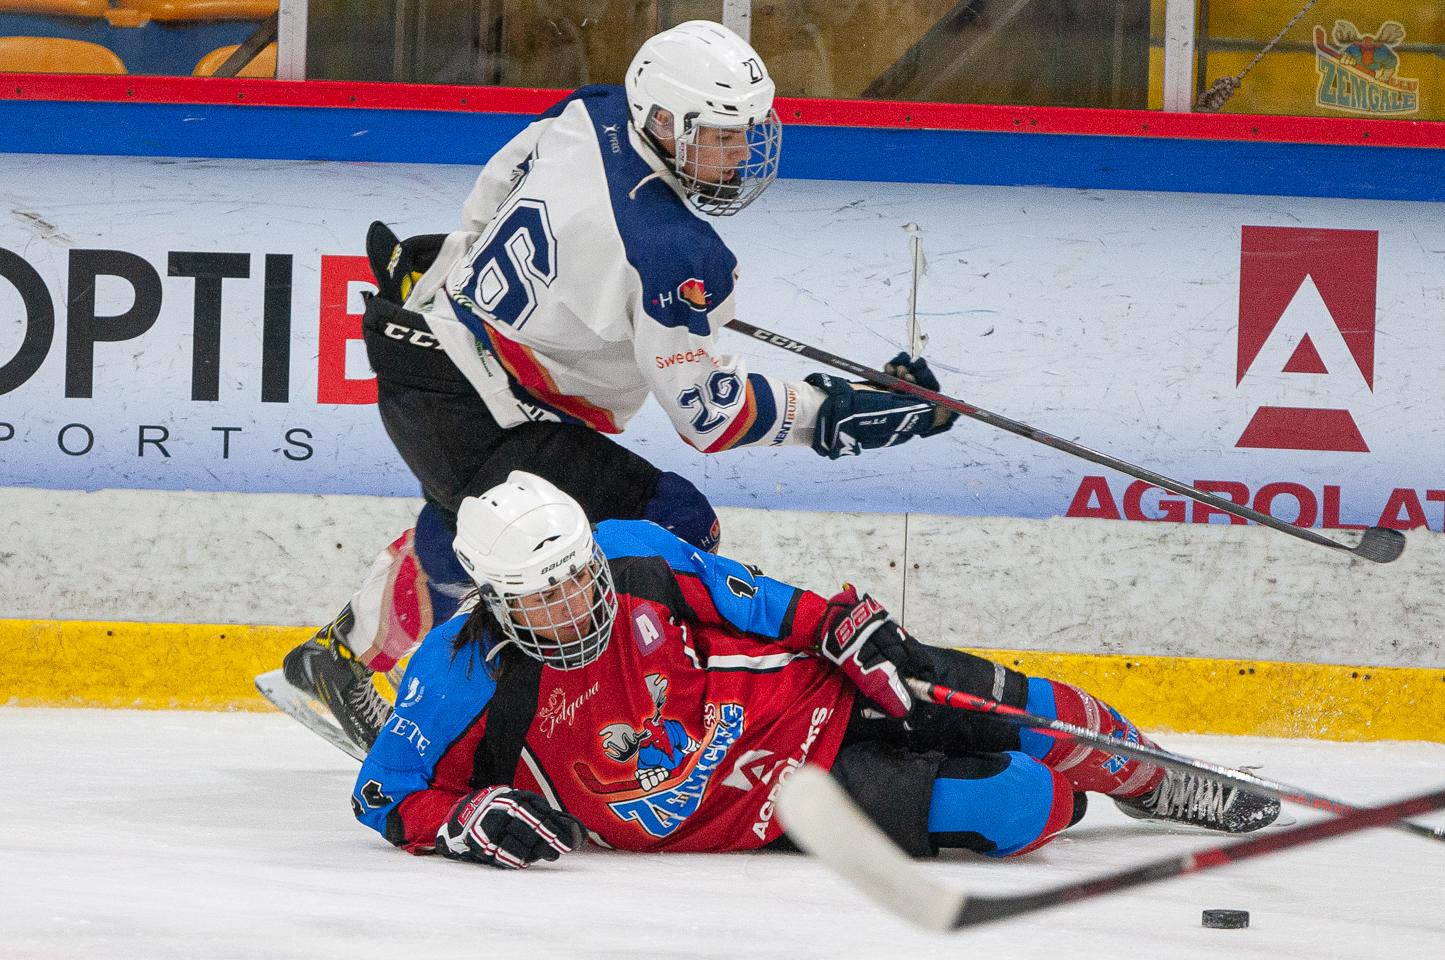 Jelgavas hokeja skola JLSS U17 - Venta 2002 14092019-14